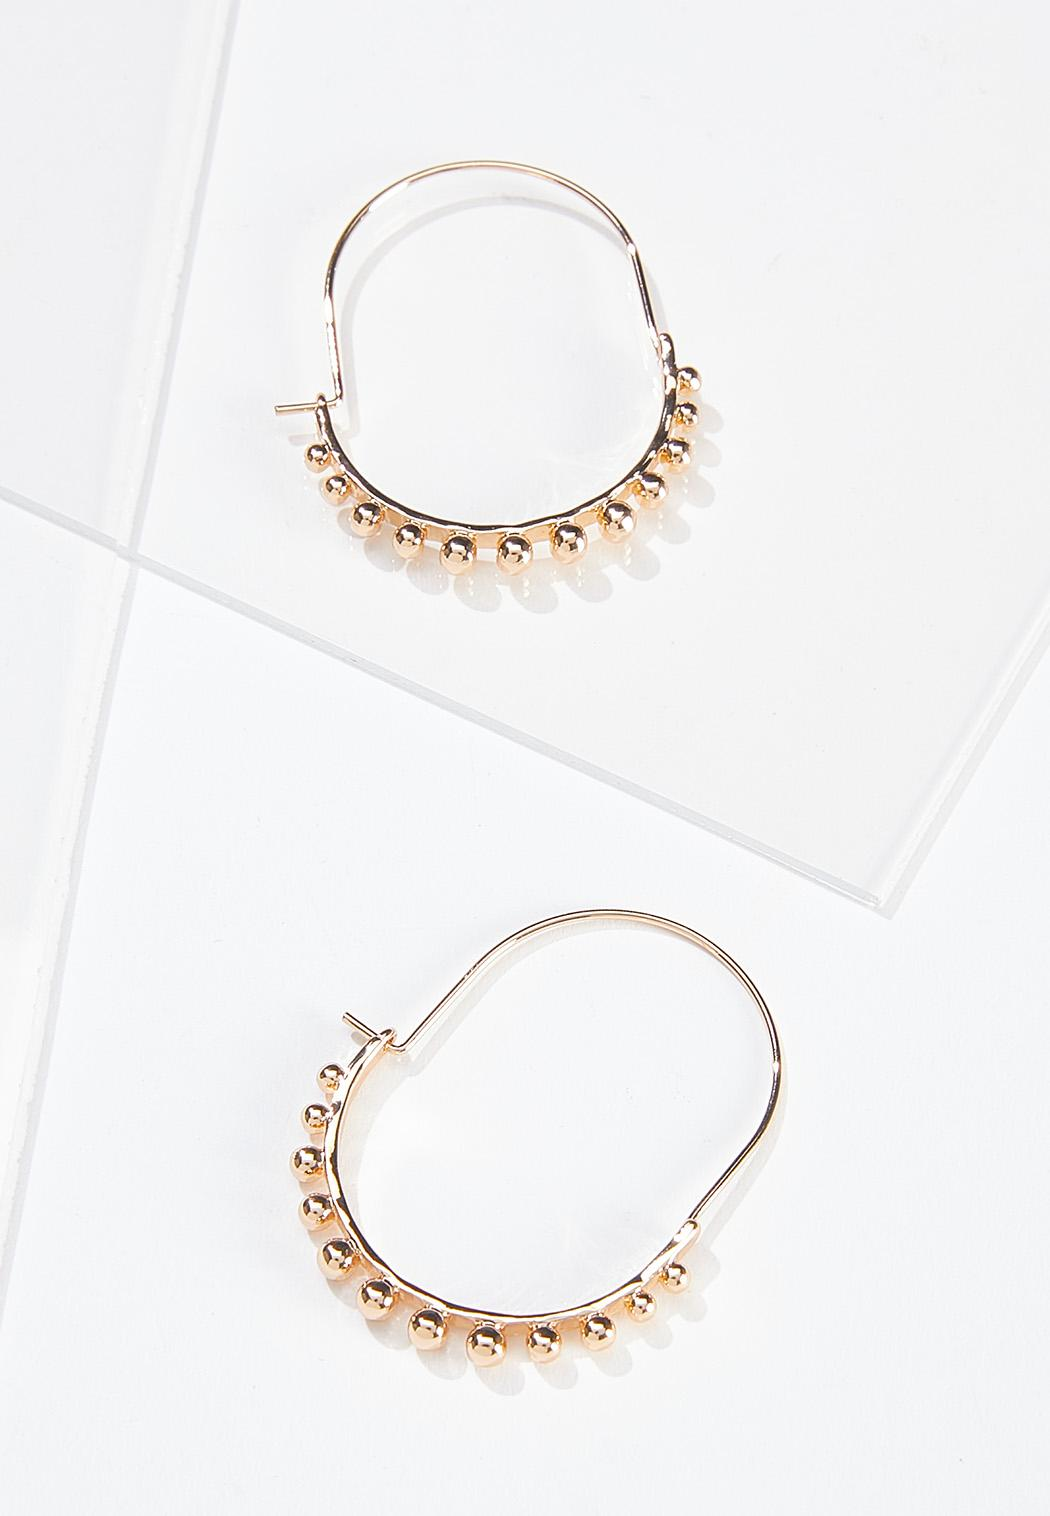 Beaded Oval Hoop Earrings